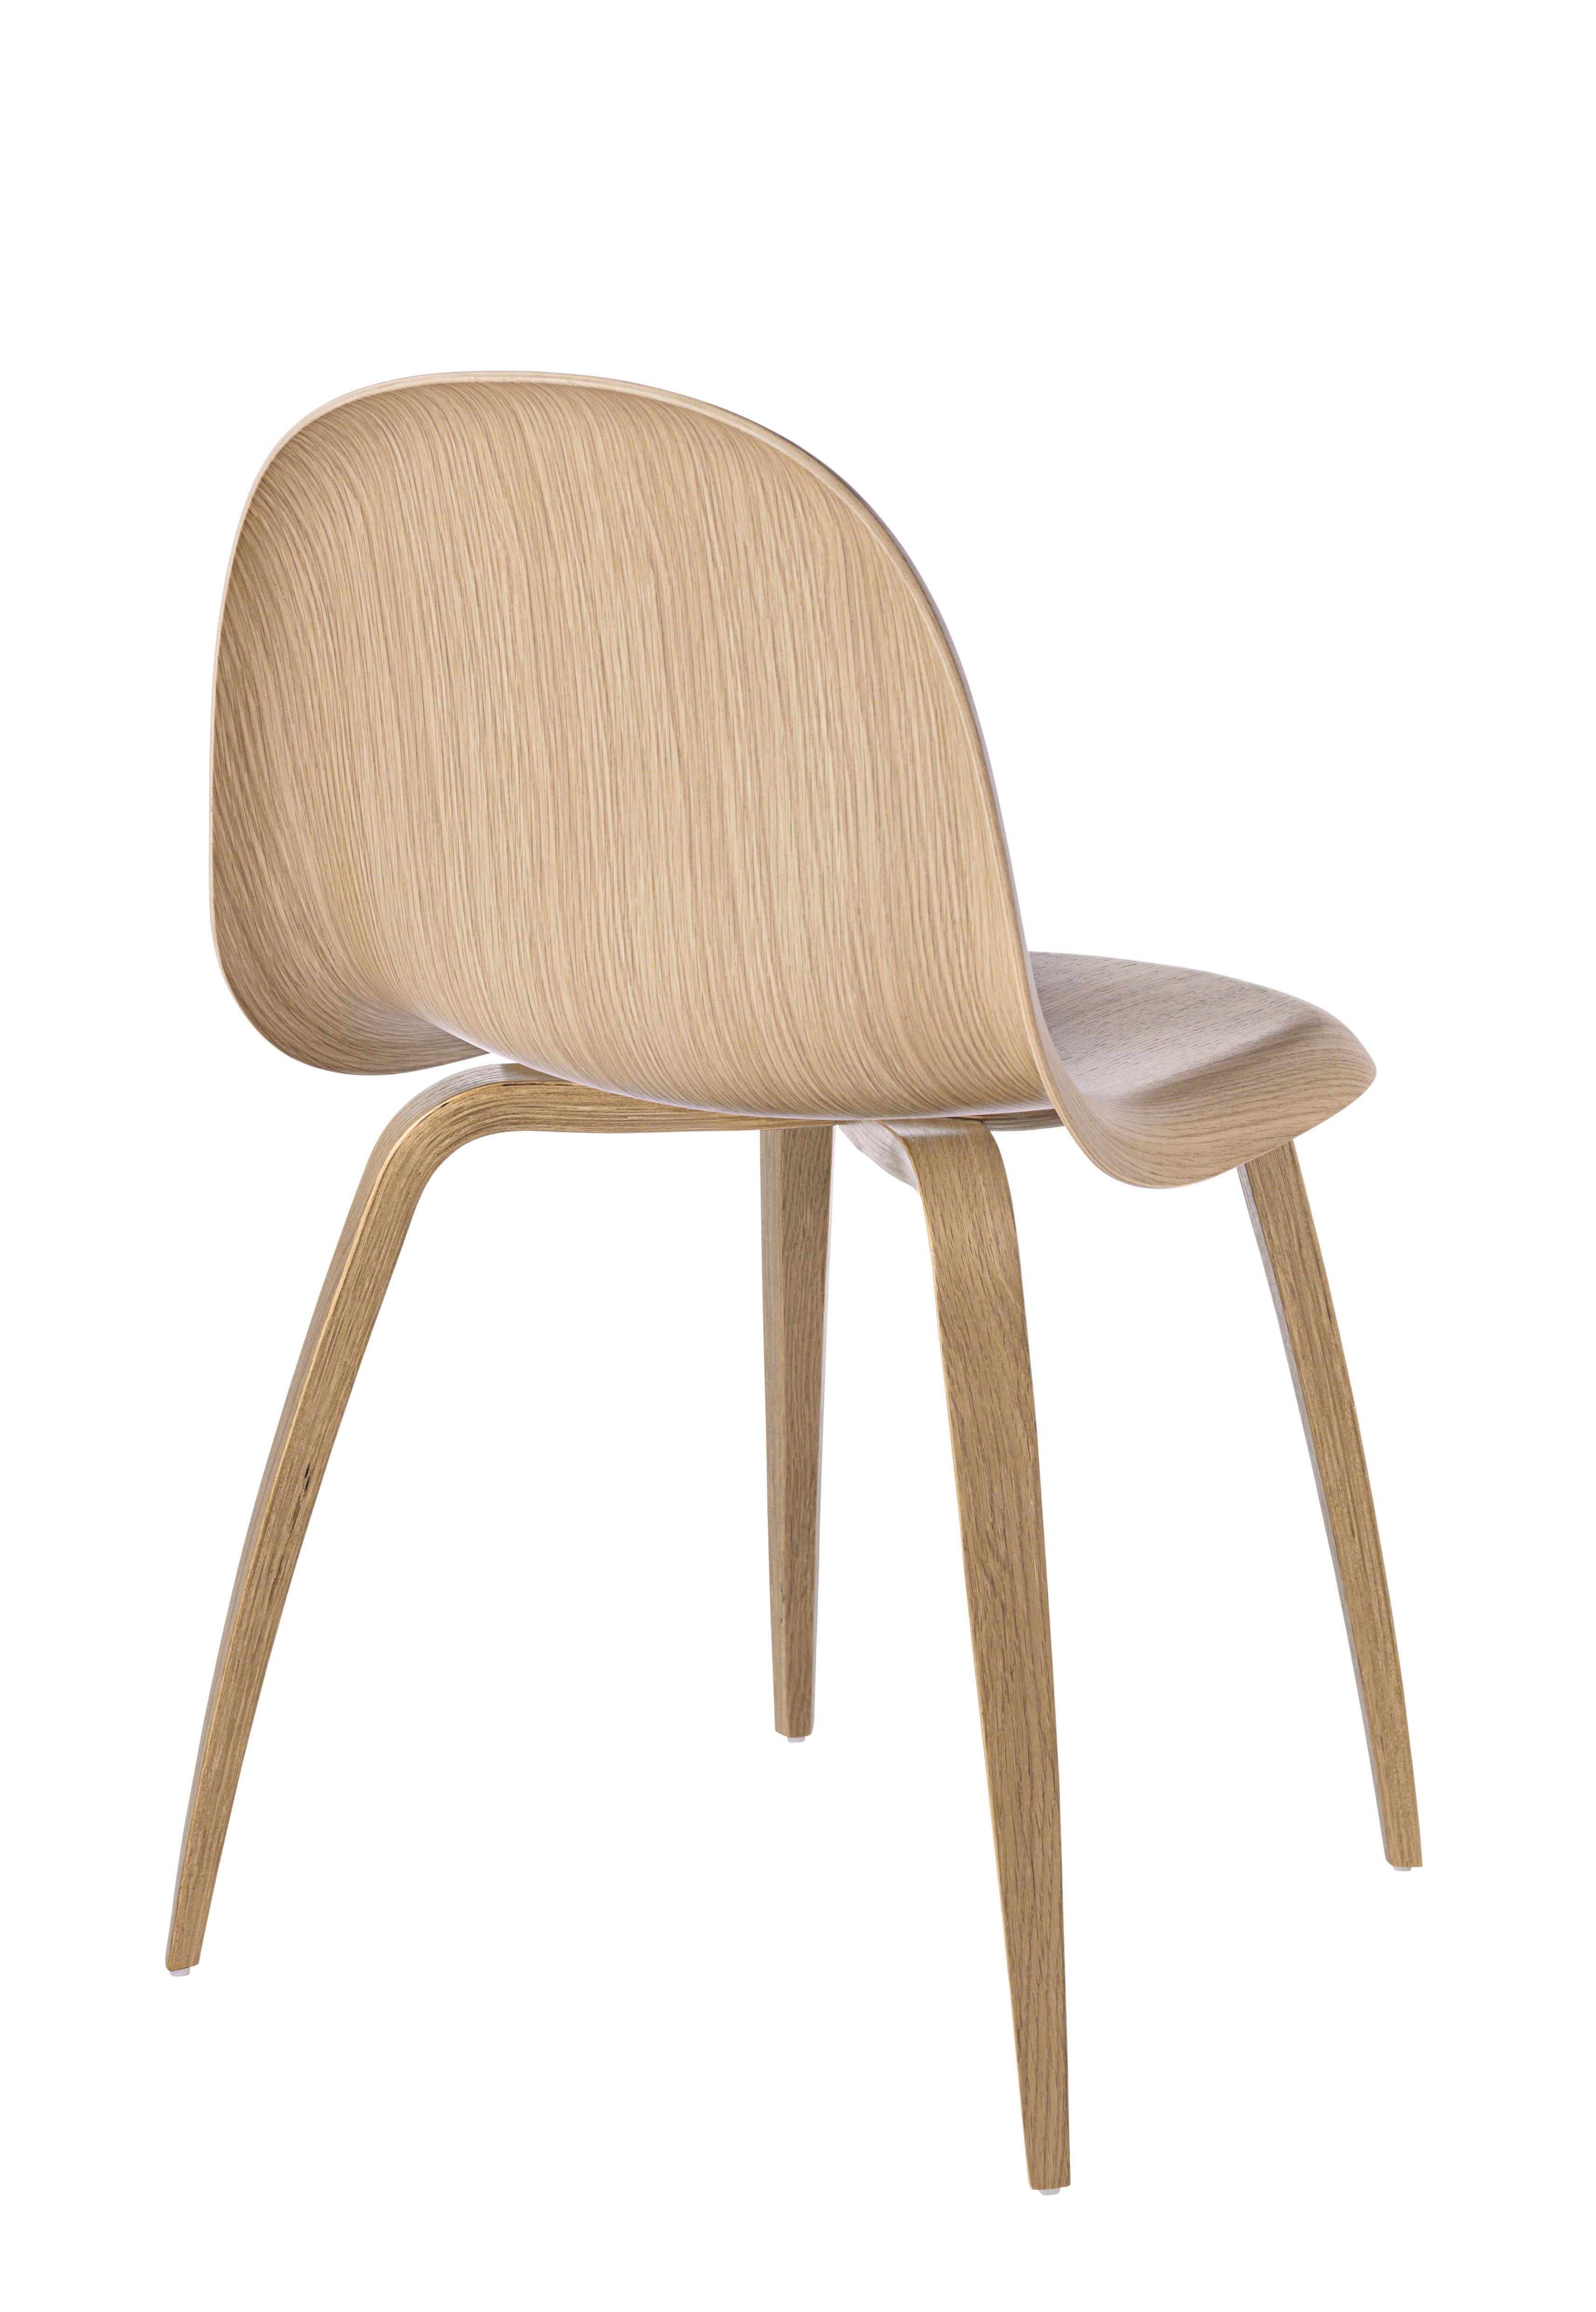 Chaise gubi 5 coque pieds ch ne coque ch ne for Chaise gubi